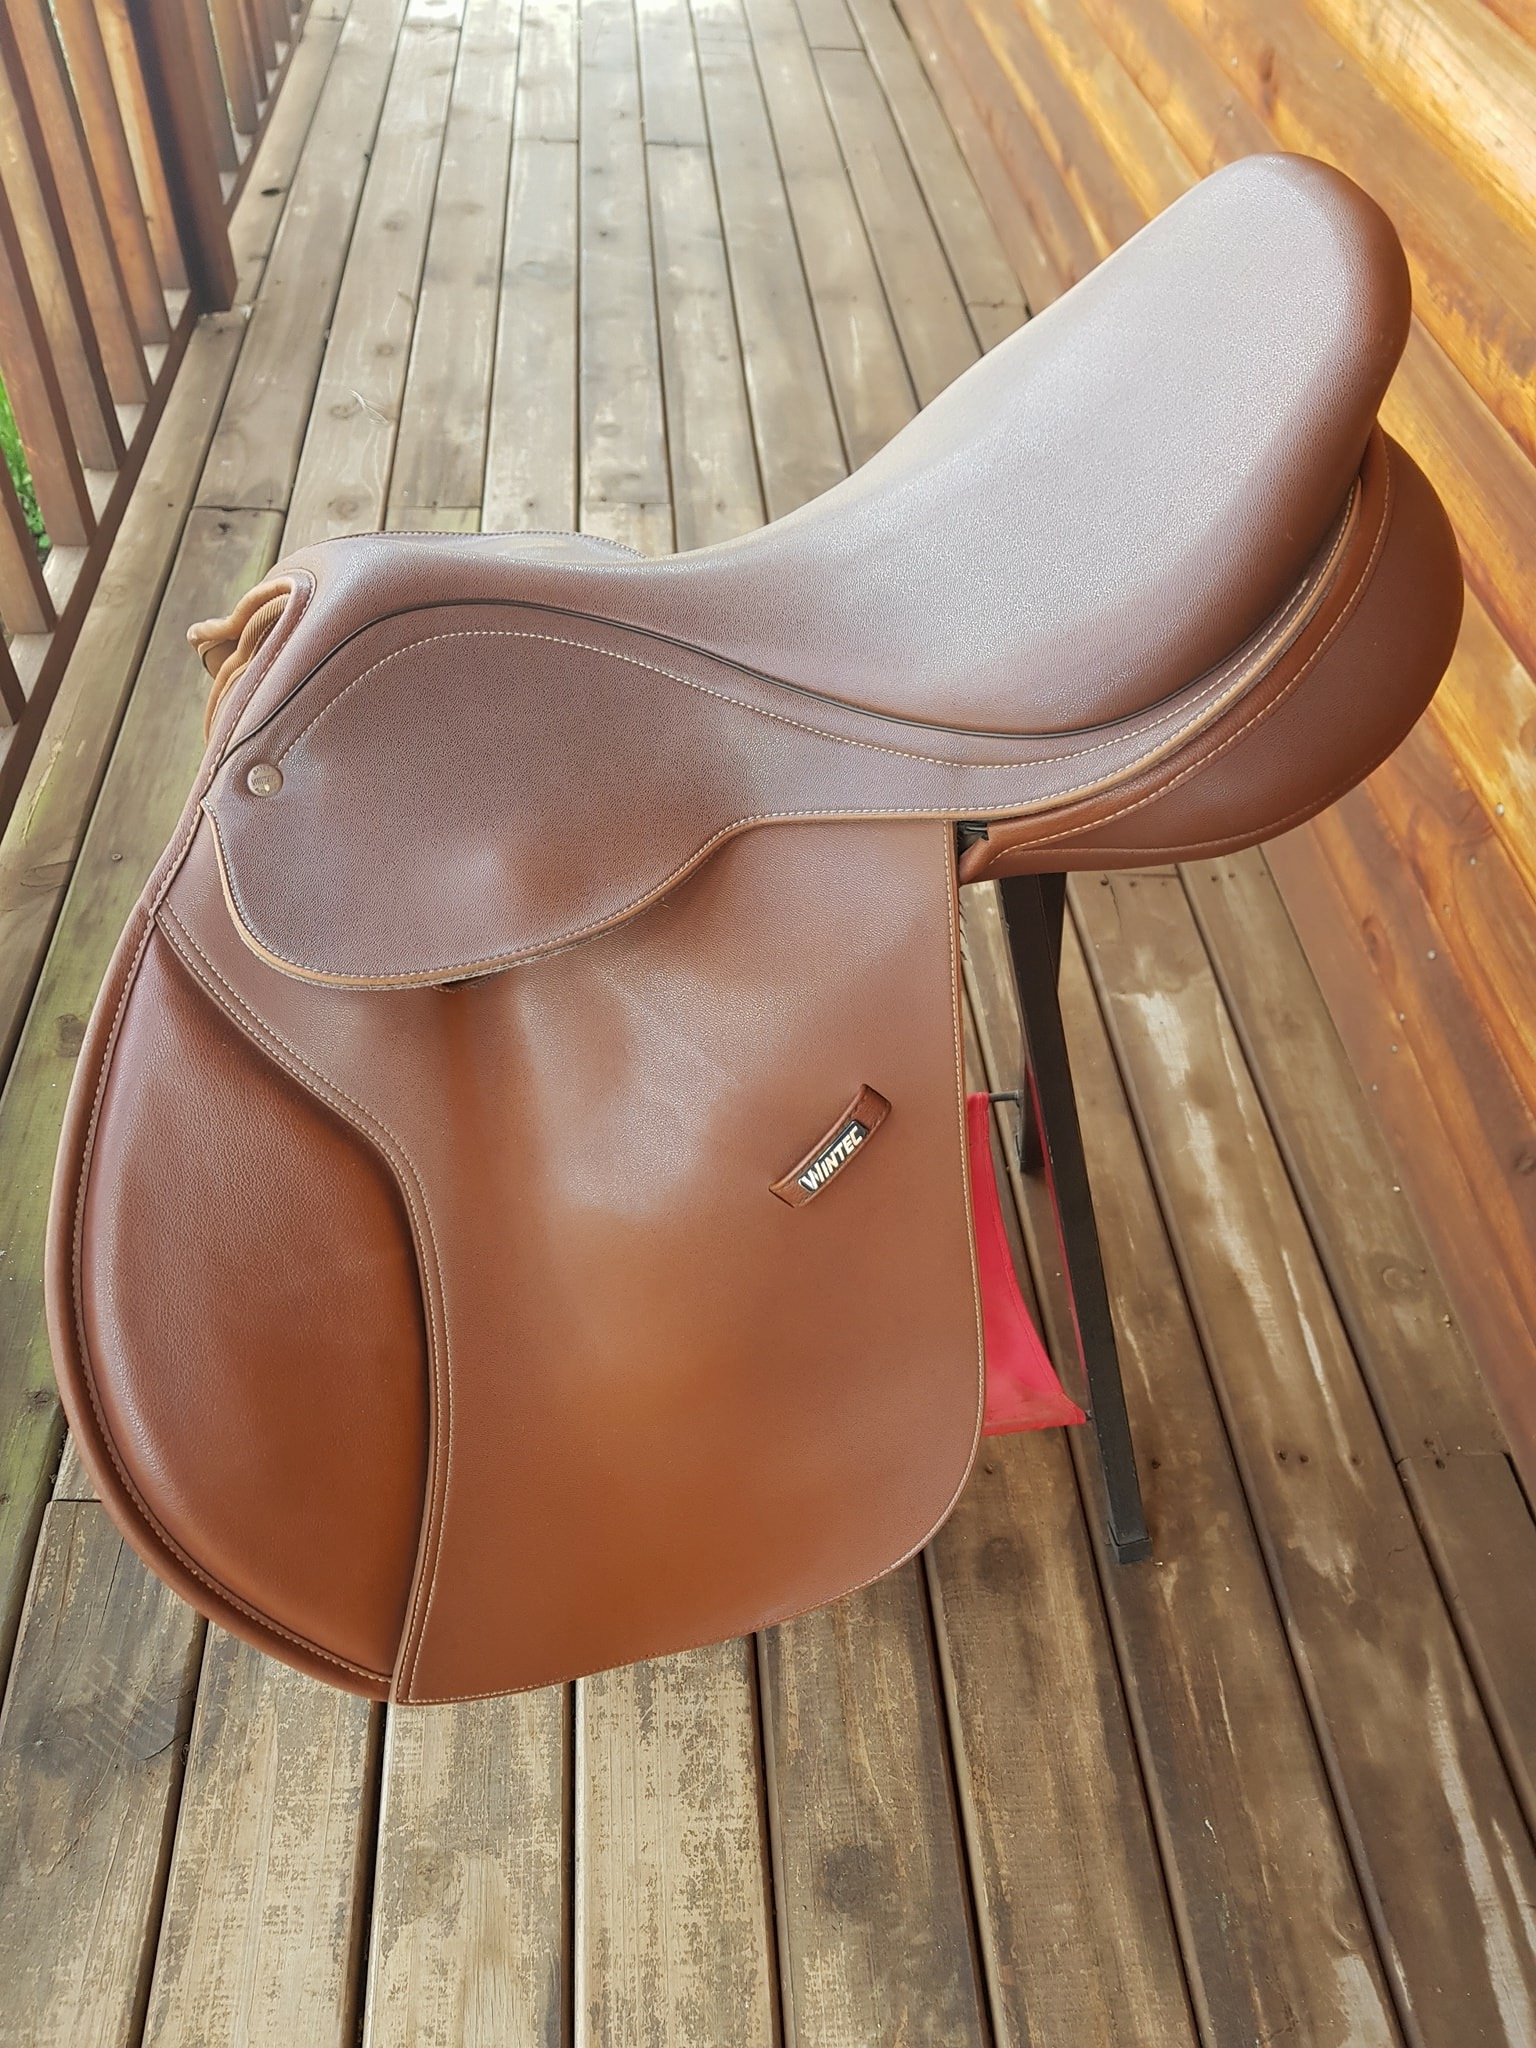 Wintec Jumping saddle